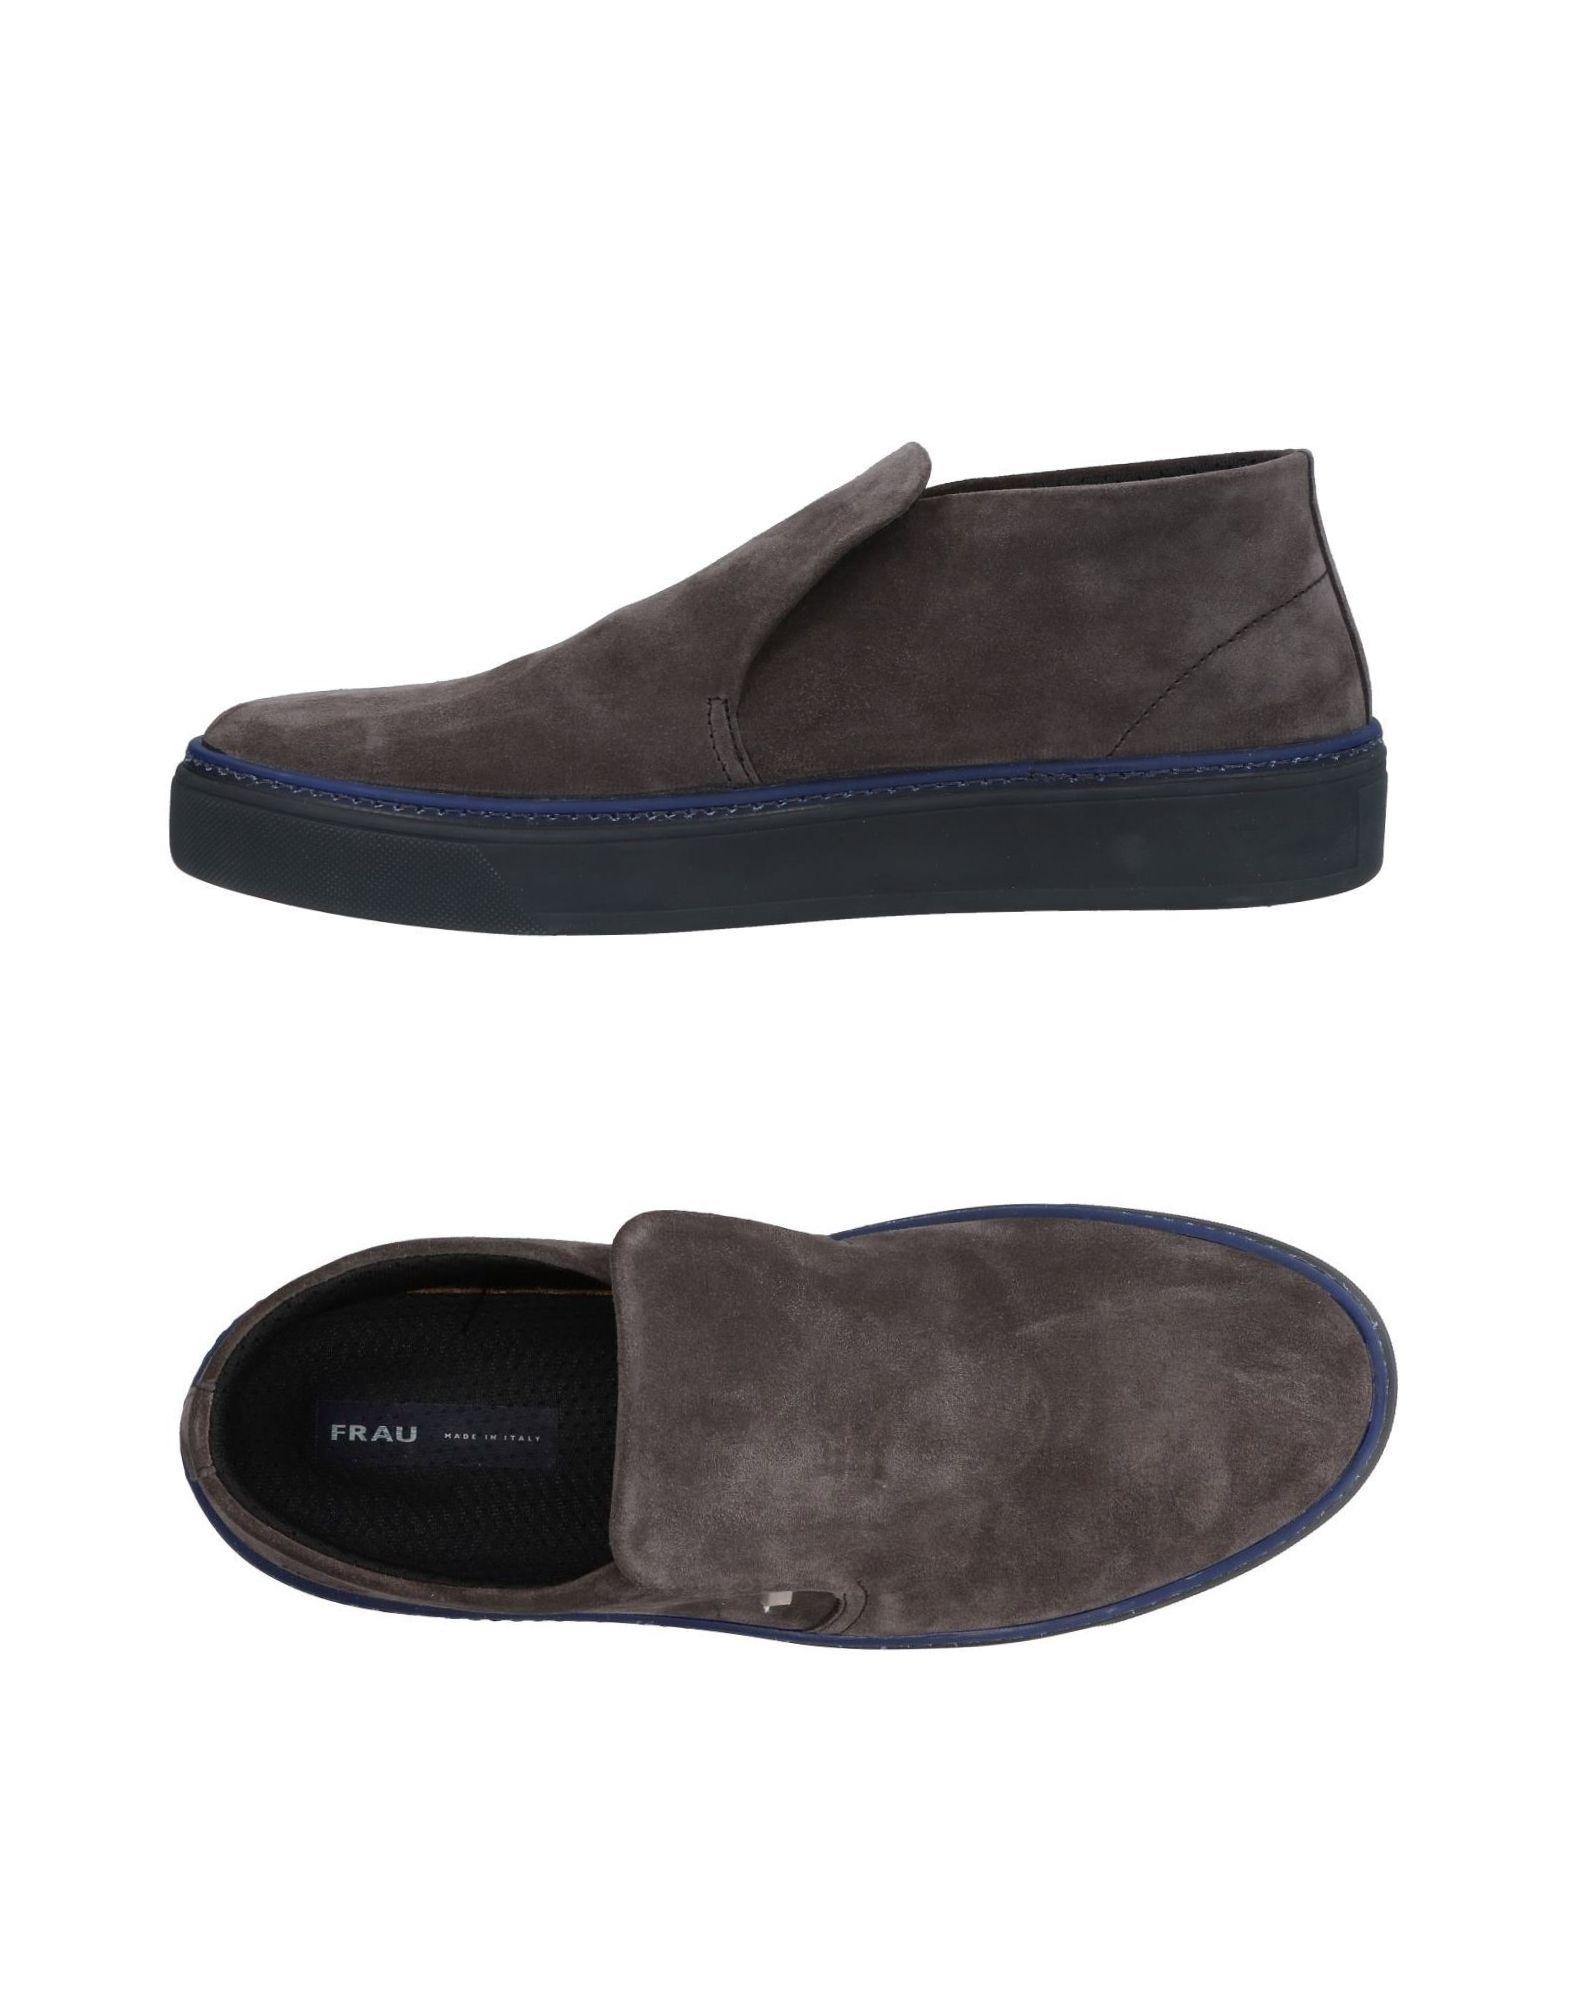 Rabatt echte Schuhe Frau Sneakers Herren  11459407CU